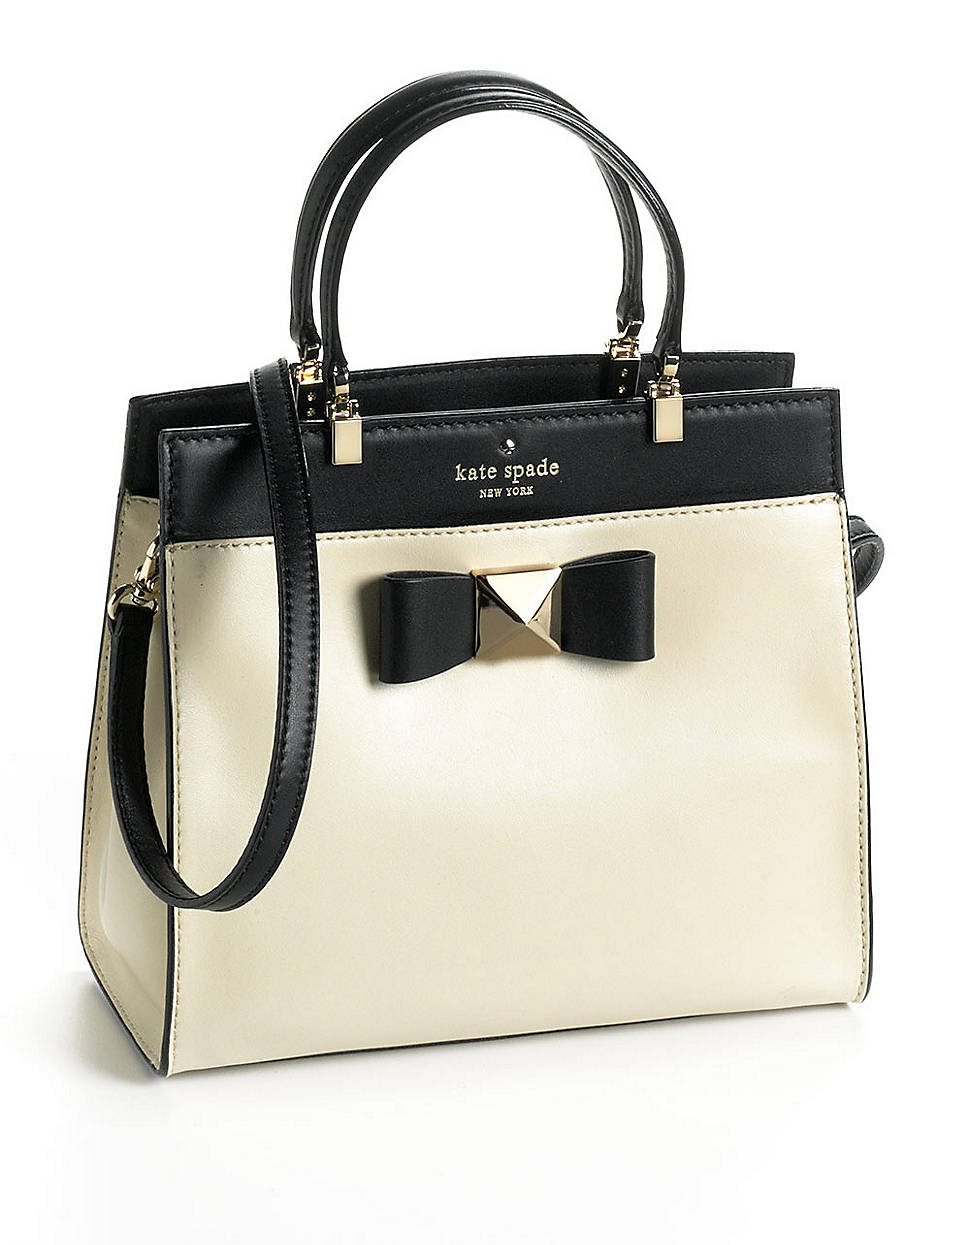 Kate Spade Leather Fulton Satchel Handbag In White